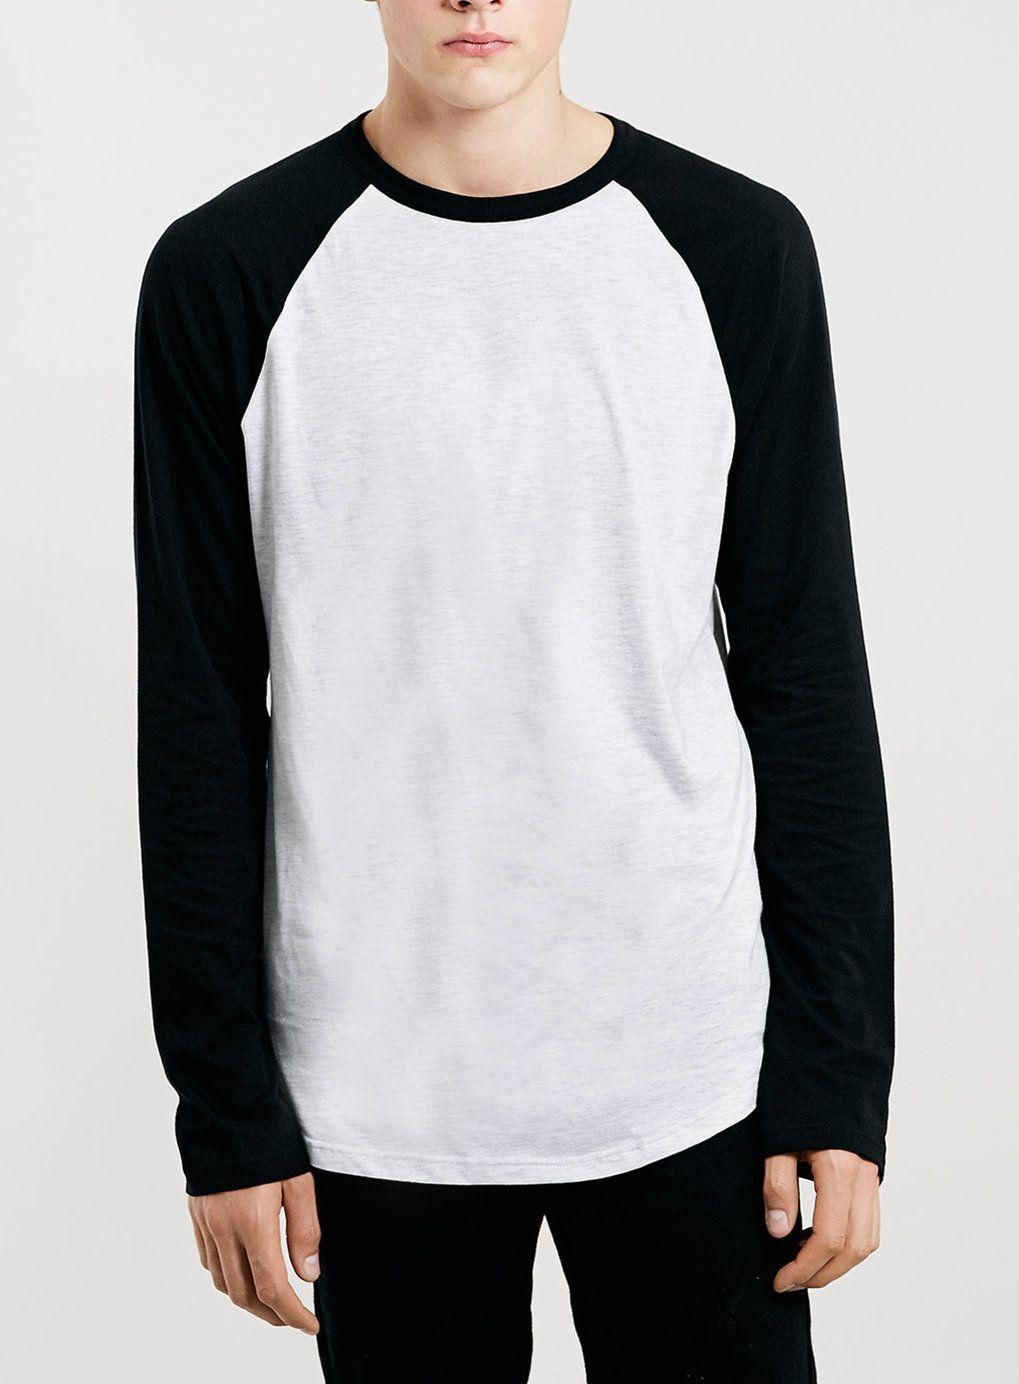 FROST/BLACK CONTRAST RAGLAN LONGSLEEVE T-SHIRT | Eric Style ...